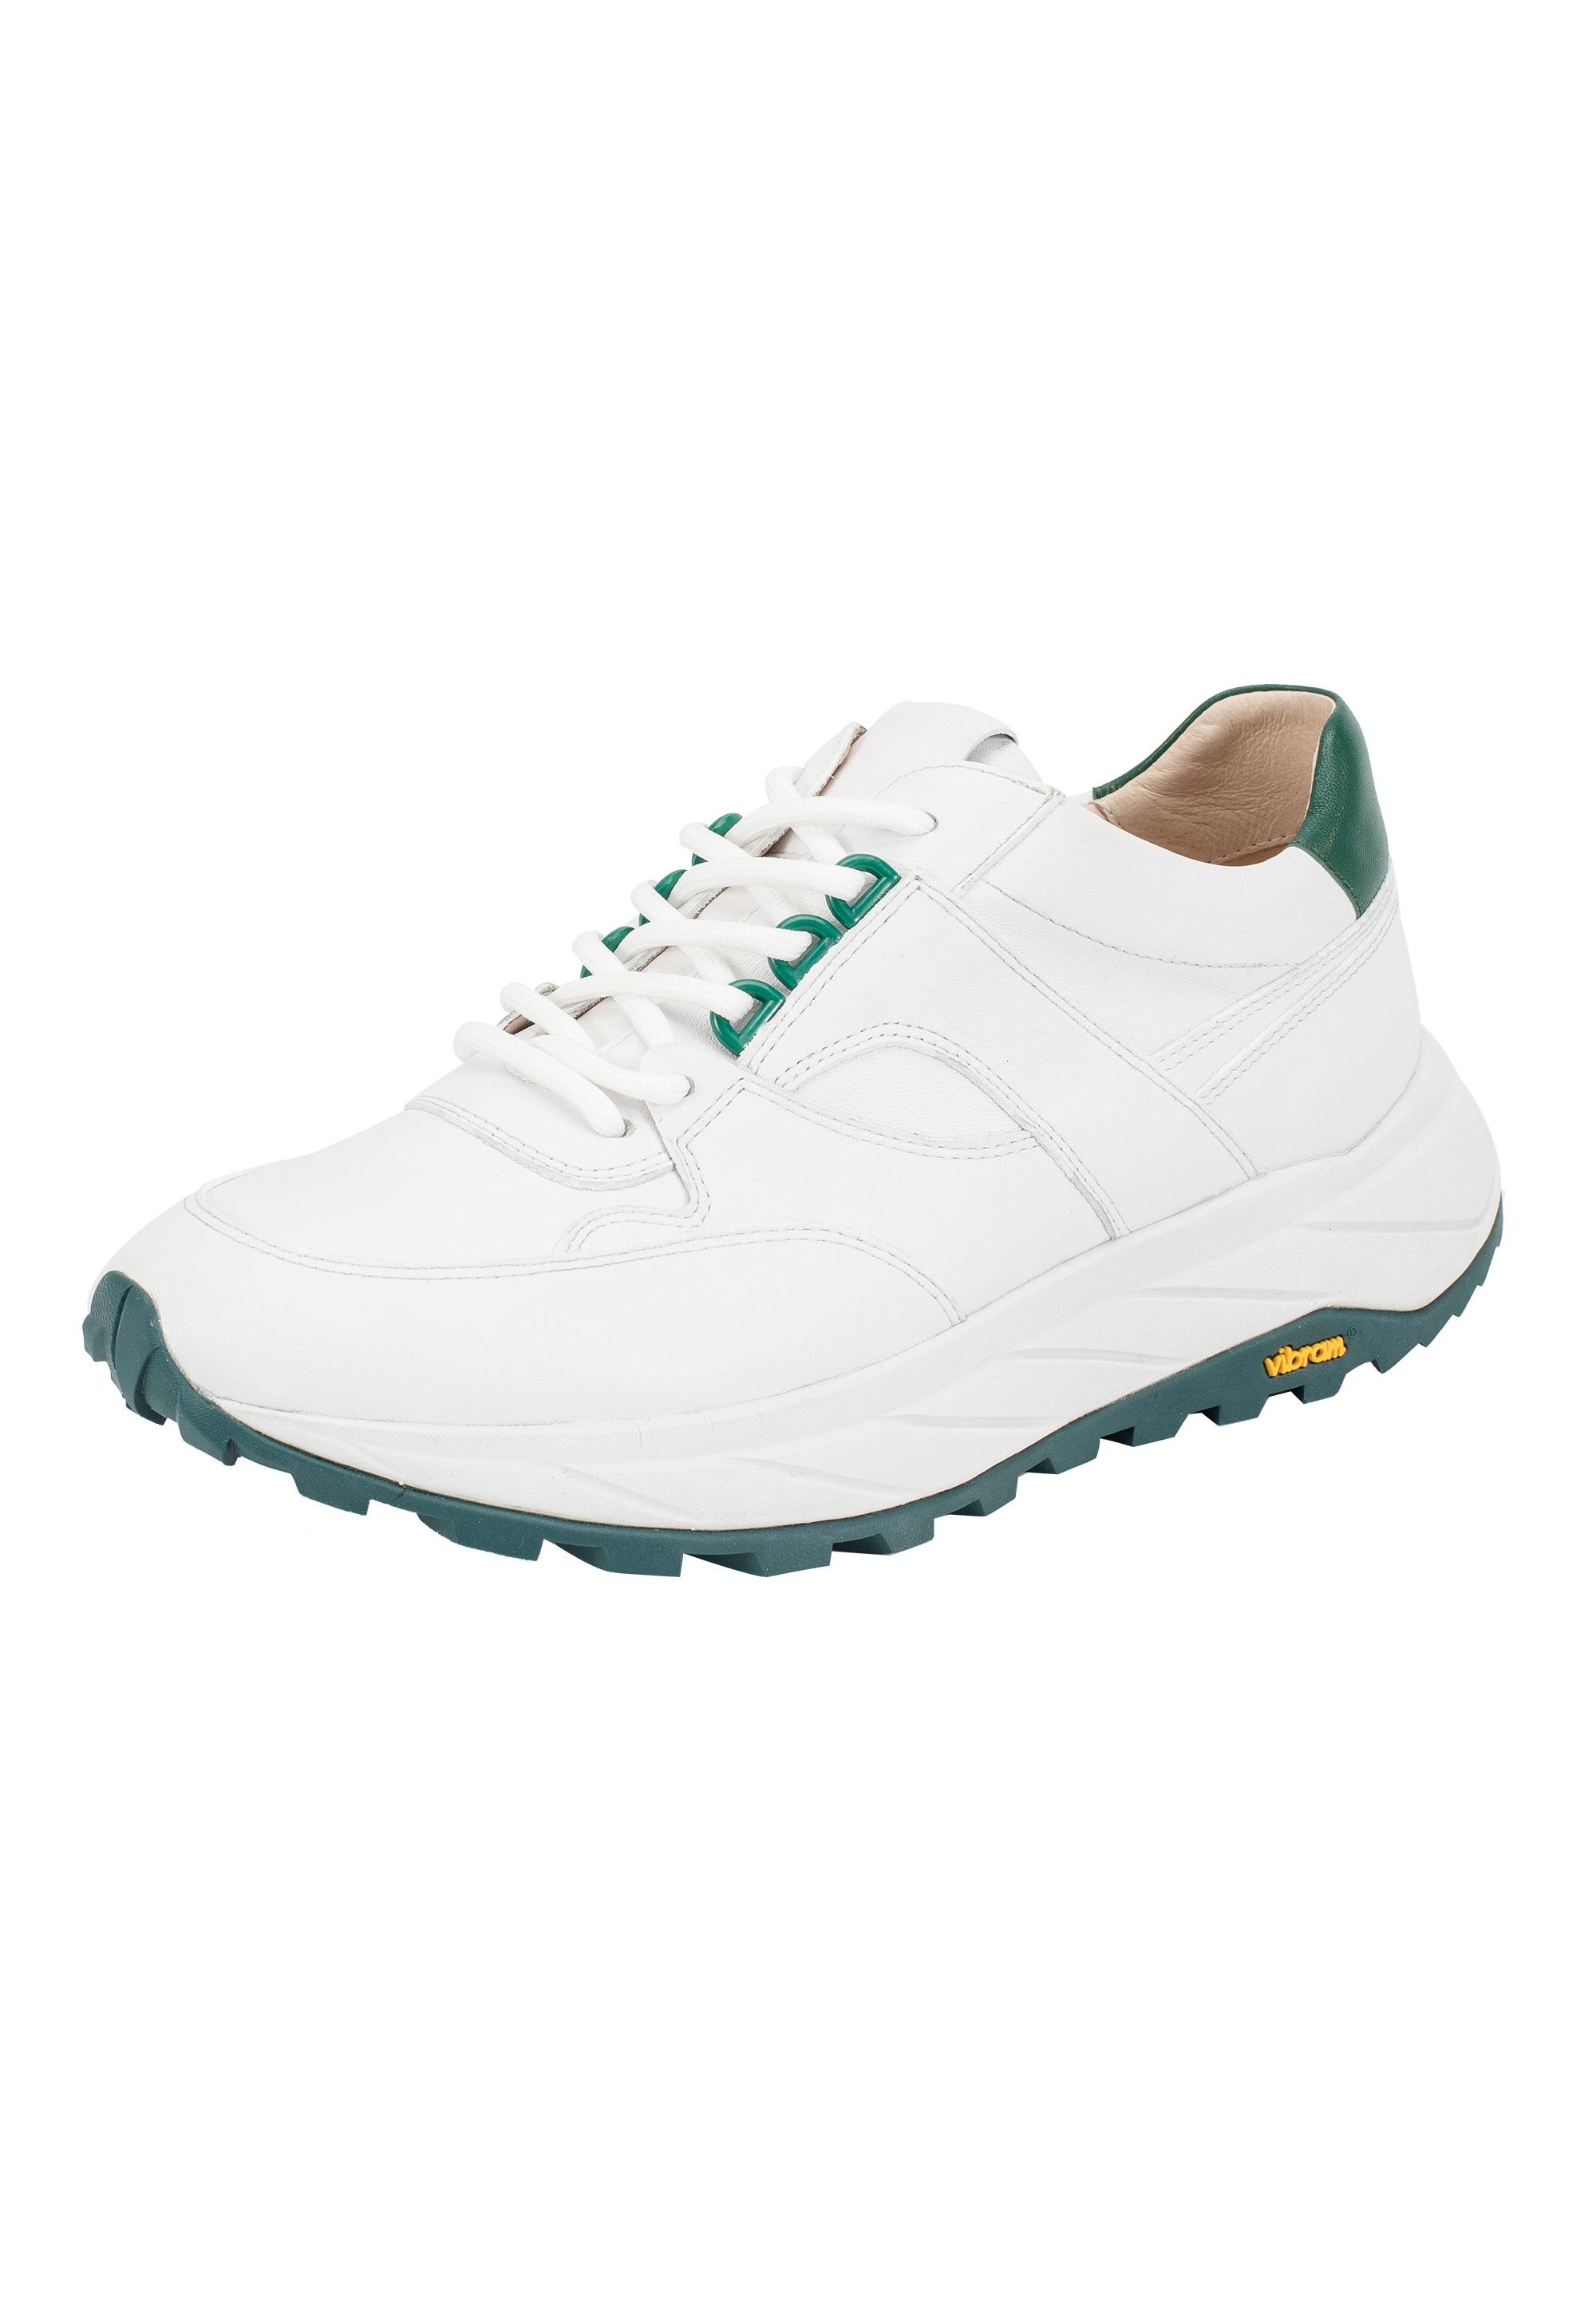 ekonika -  Sneaker, mit verstärkter Sohle